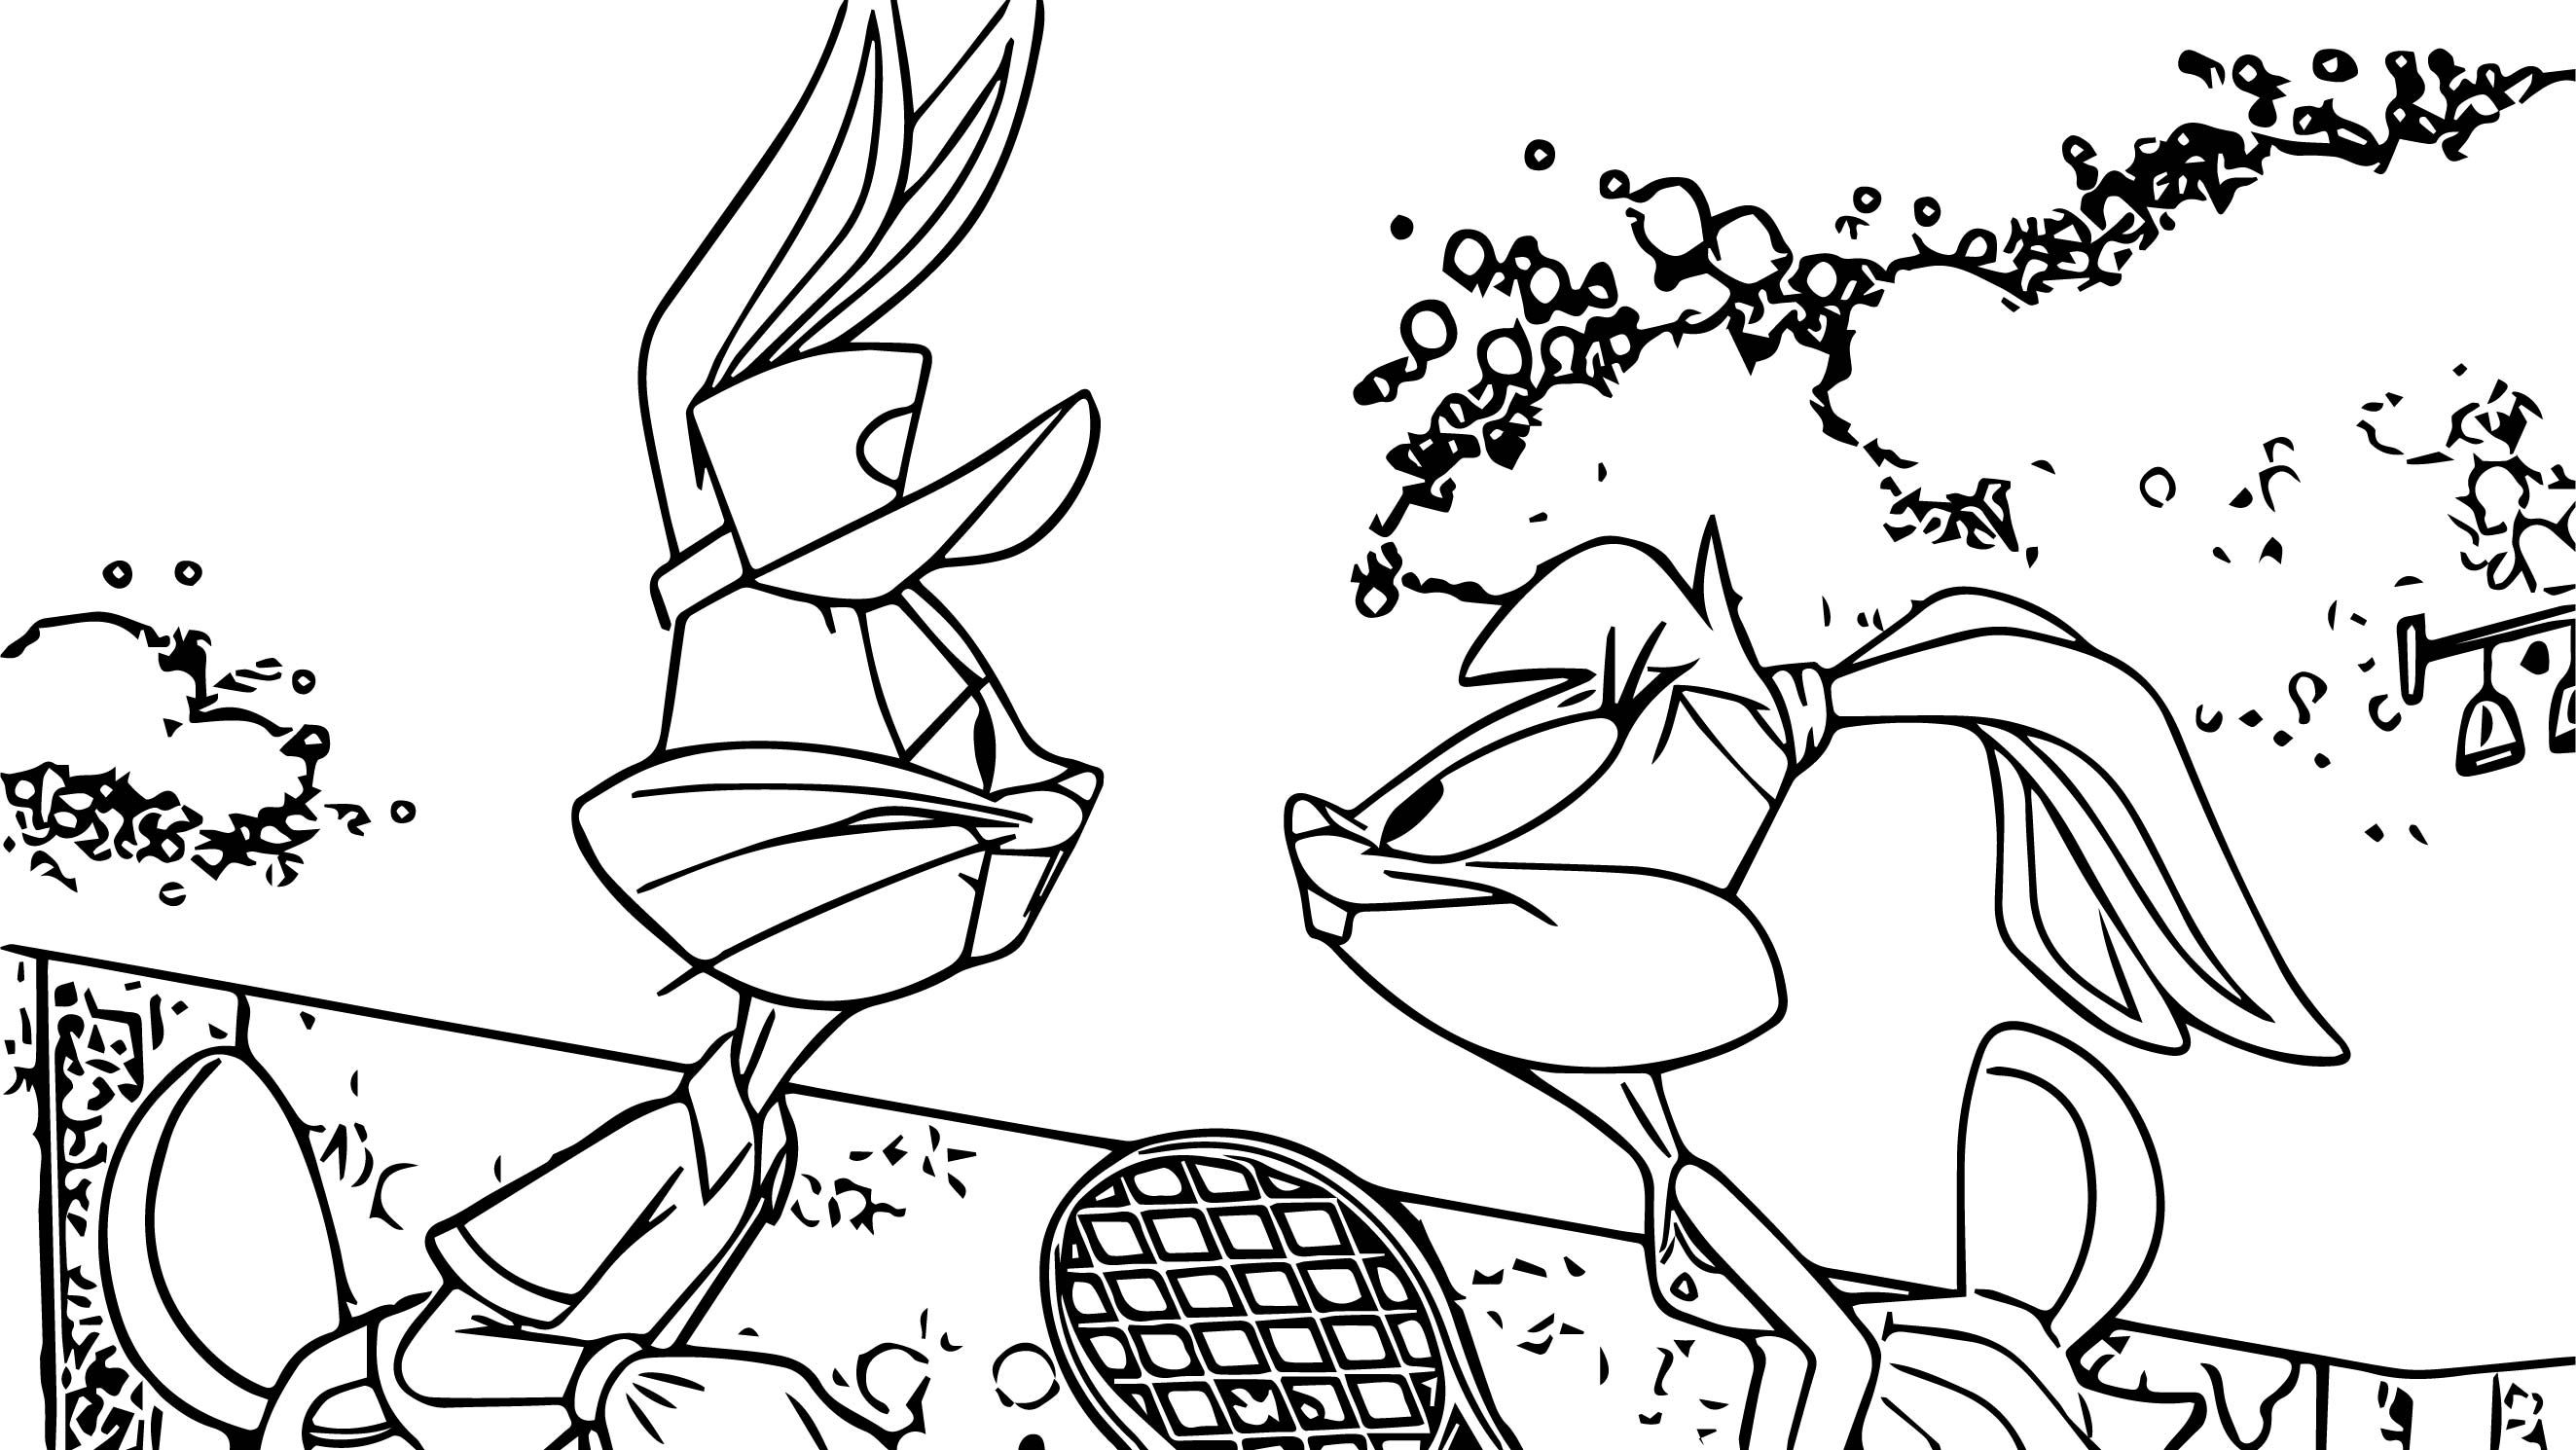 Nice Looney Tunes Bugs Bunny And Lola Bunny Tennis Love Coloring Page Love Coloring Pages Coloring Pages Looney Tunes Bugs Bunny